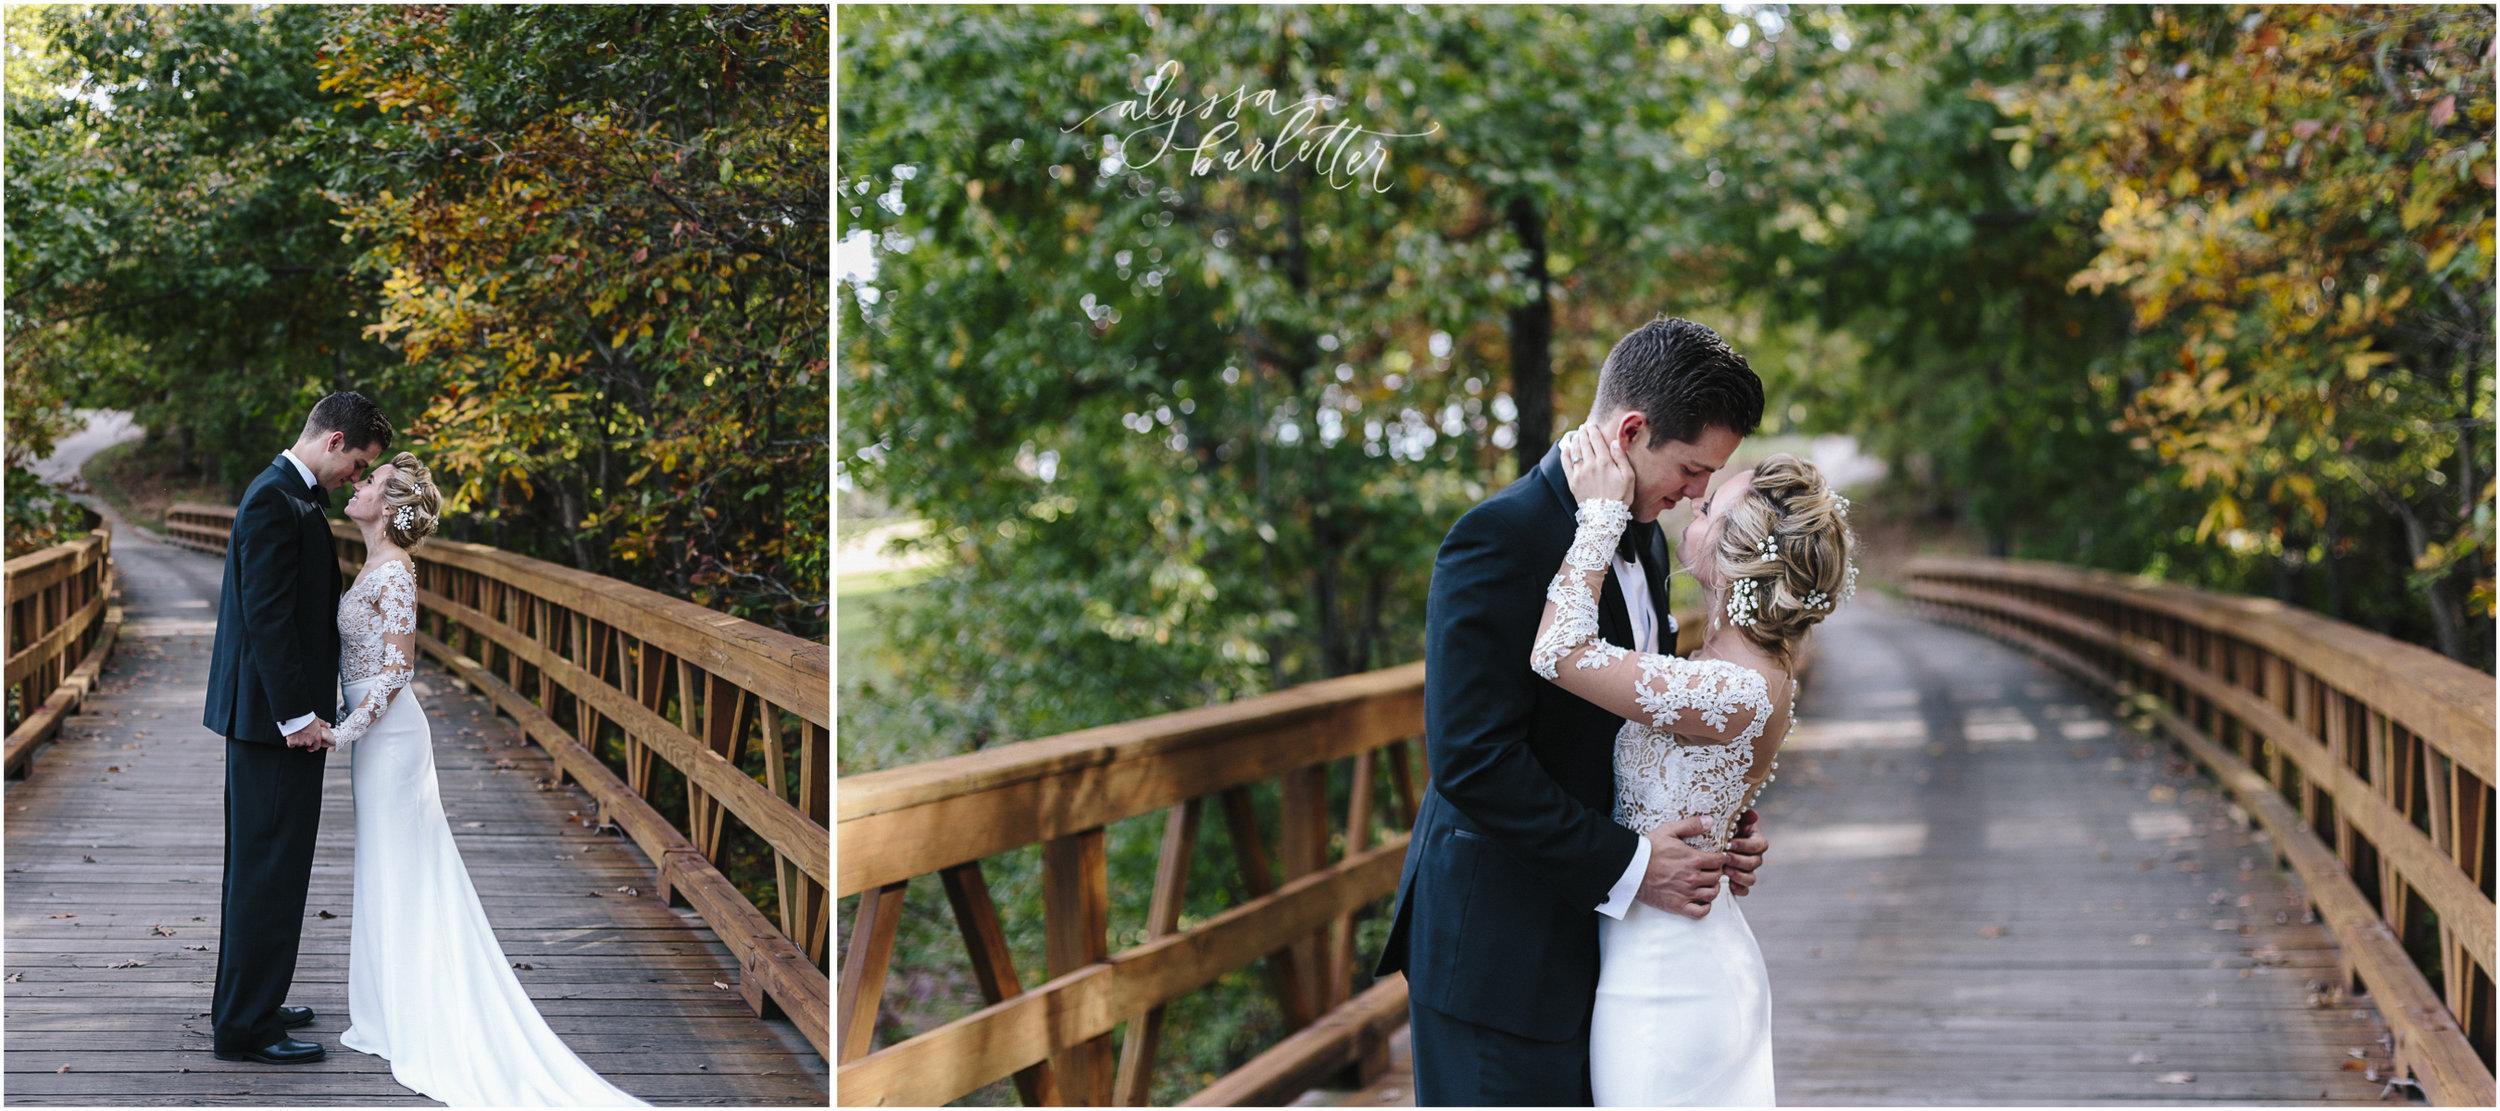 alyssa barletter photography fayetteville arkansas wedding photos micah and colin-1-24.jpg